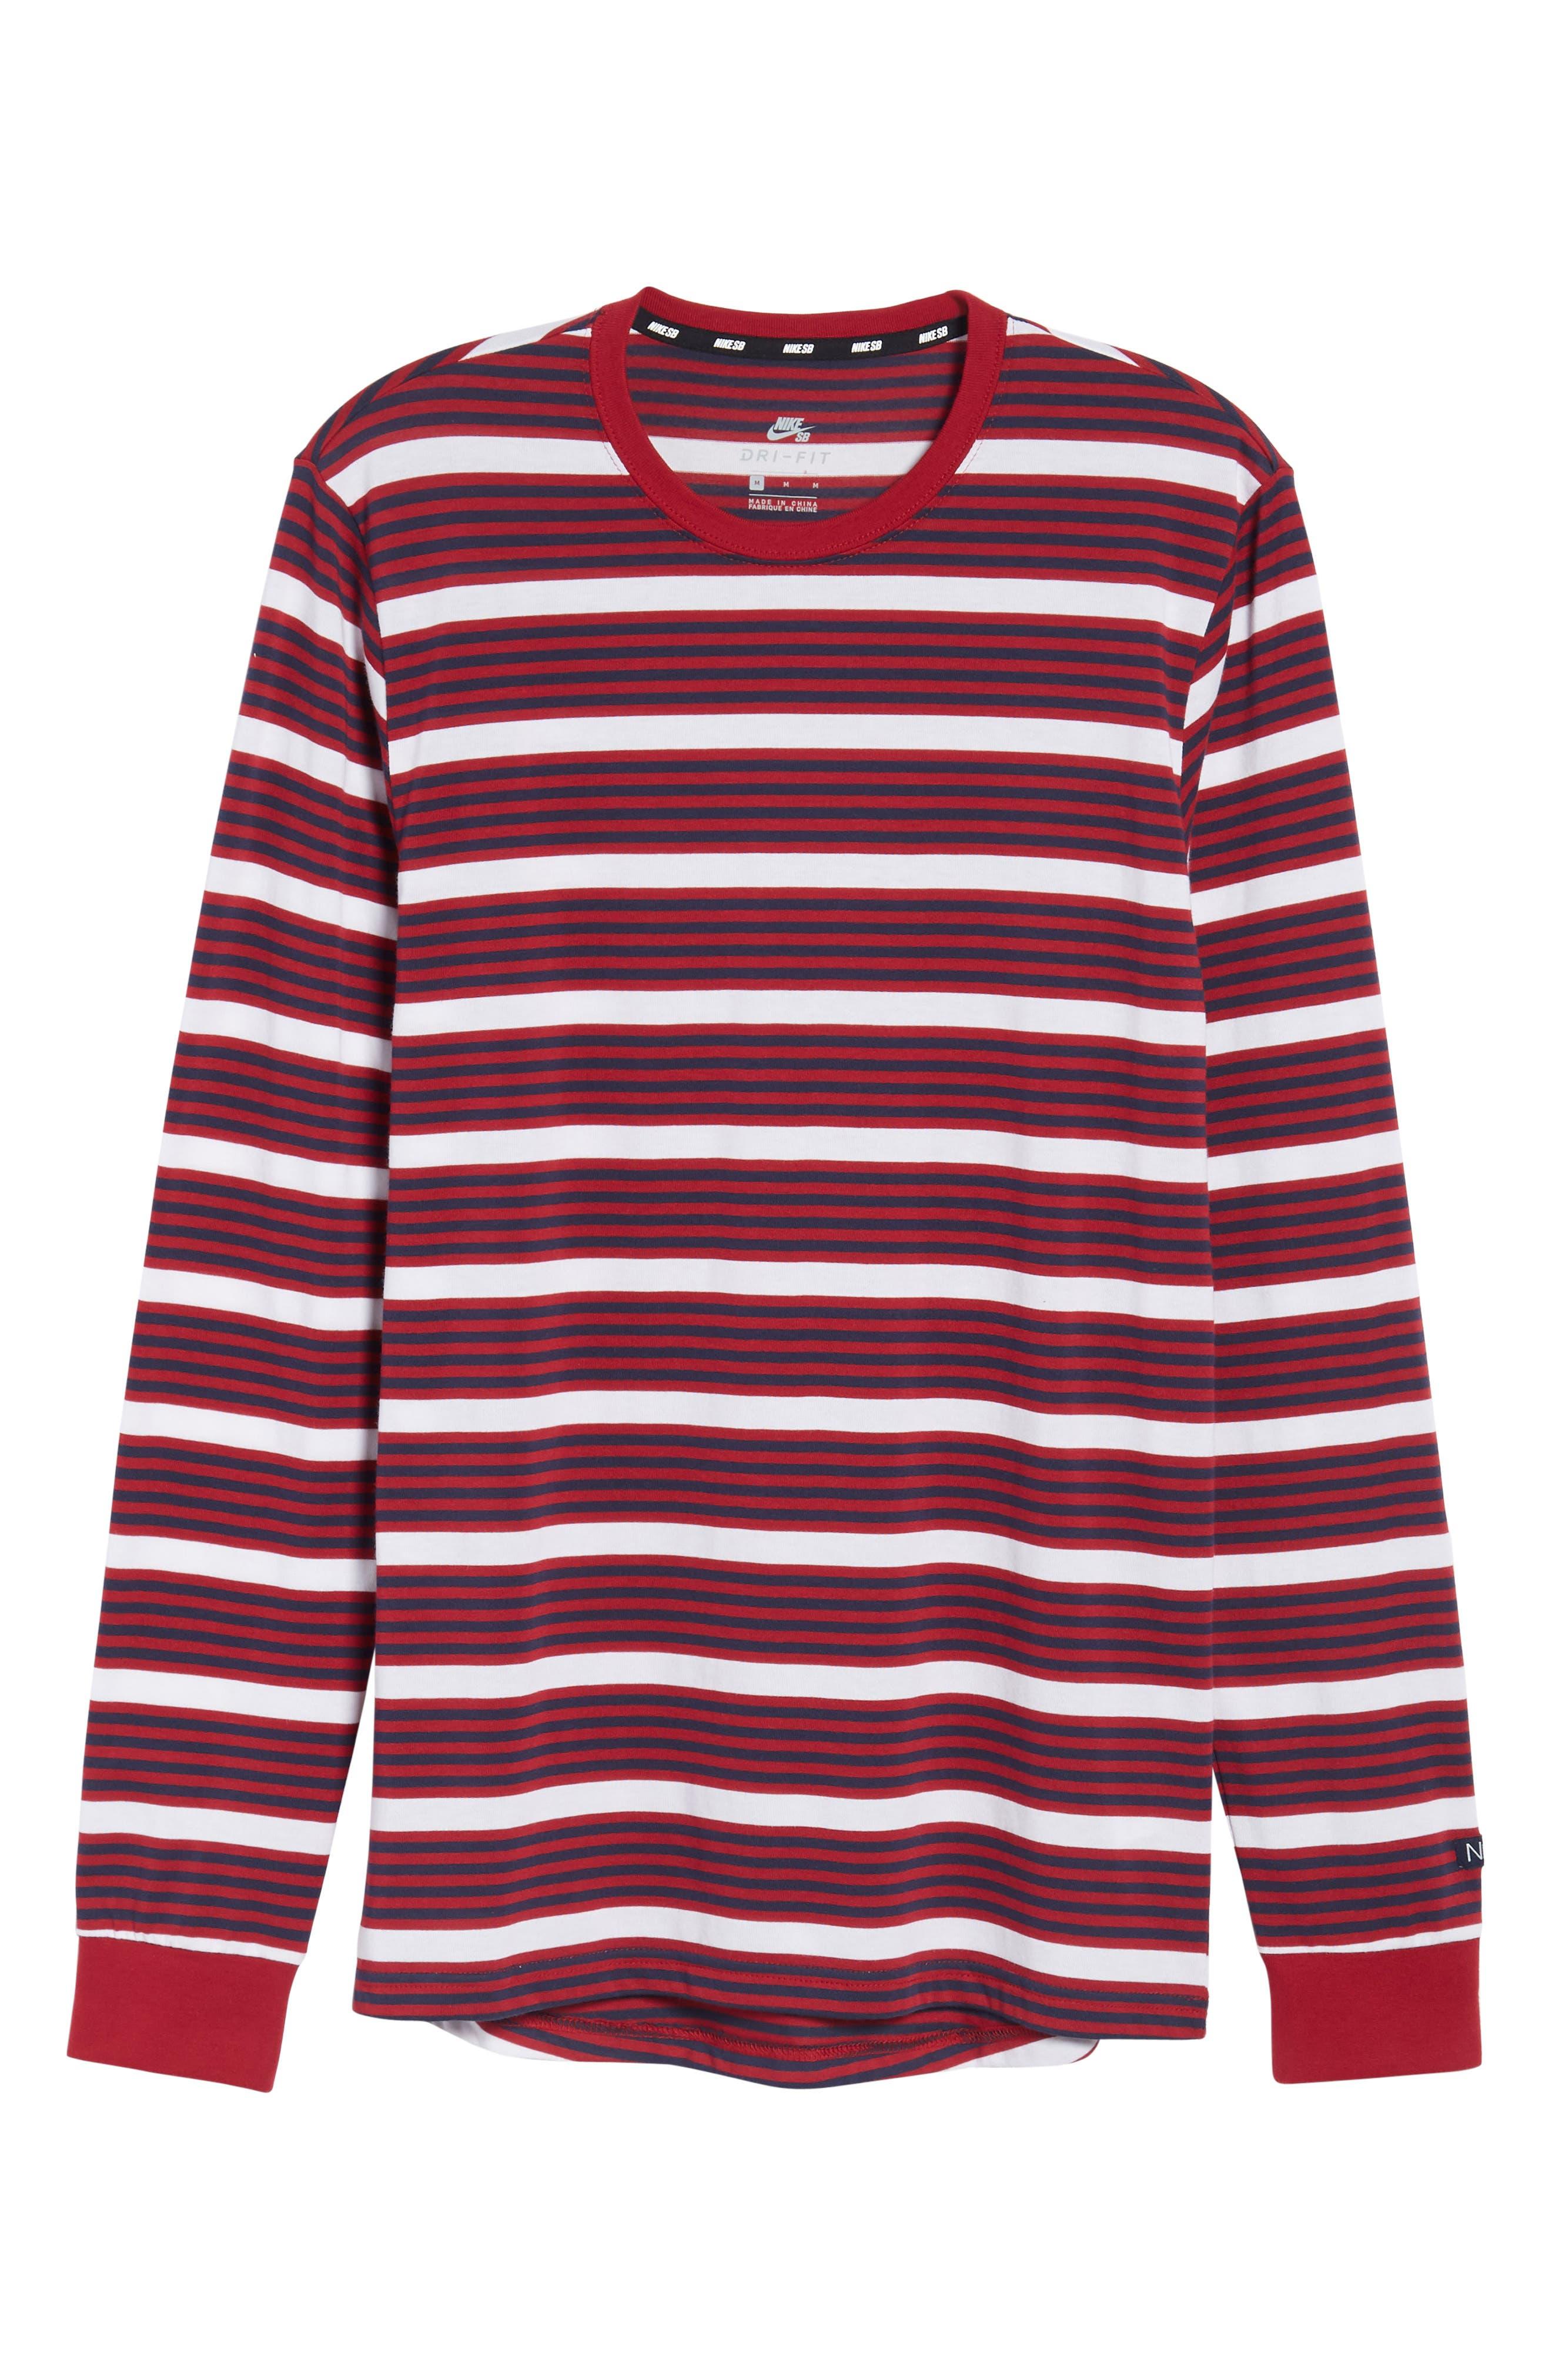 Dry Stripe Long Sleeve T-Shirt,                             Alternate thumbnail 6, color,                             RED CRUSH/ OBSIDIAN